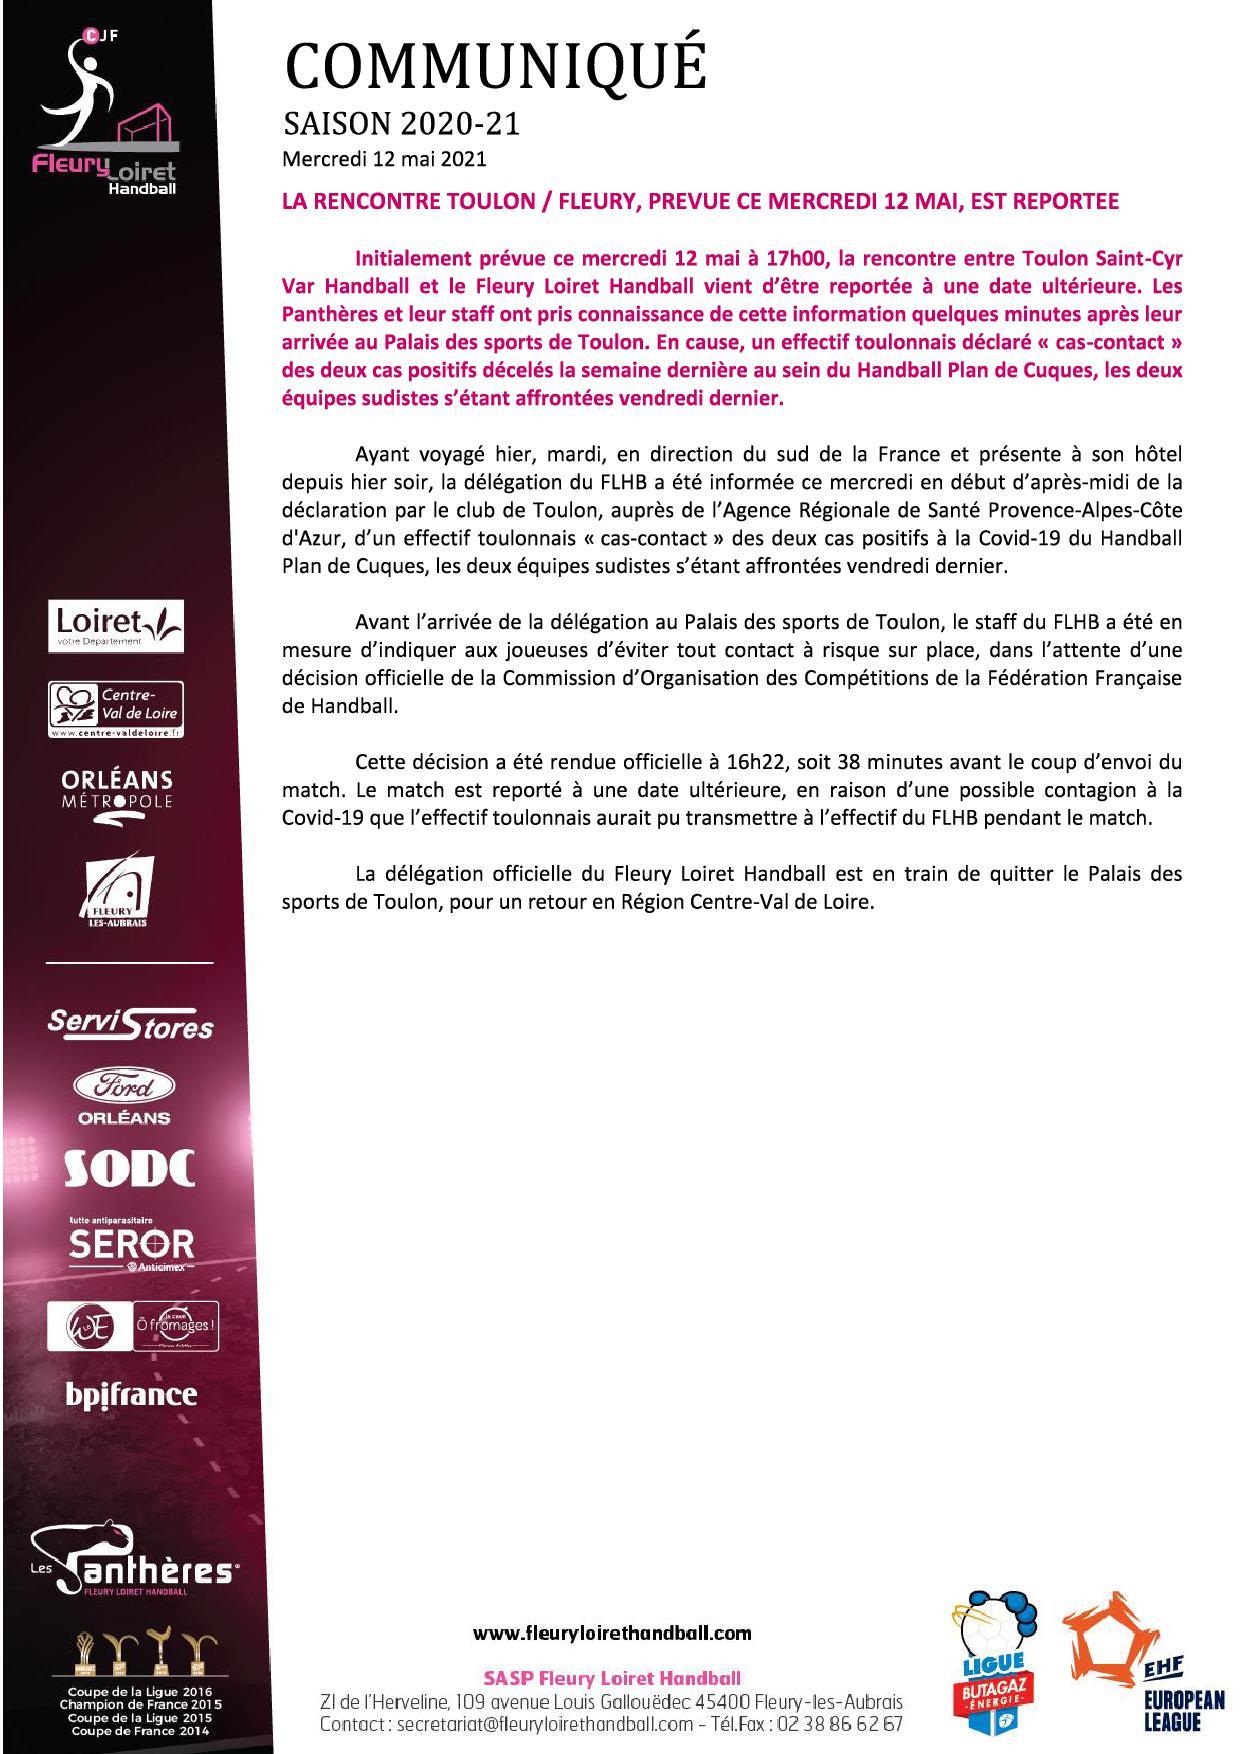 Communiqué Fleury Loiret Handball - Mercredi 12 mai 2021.jpg